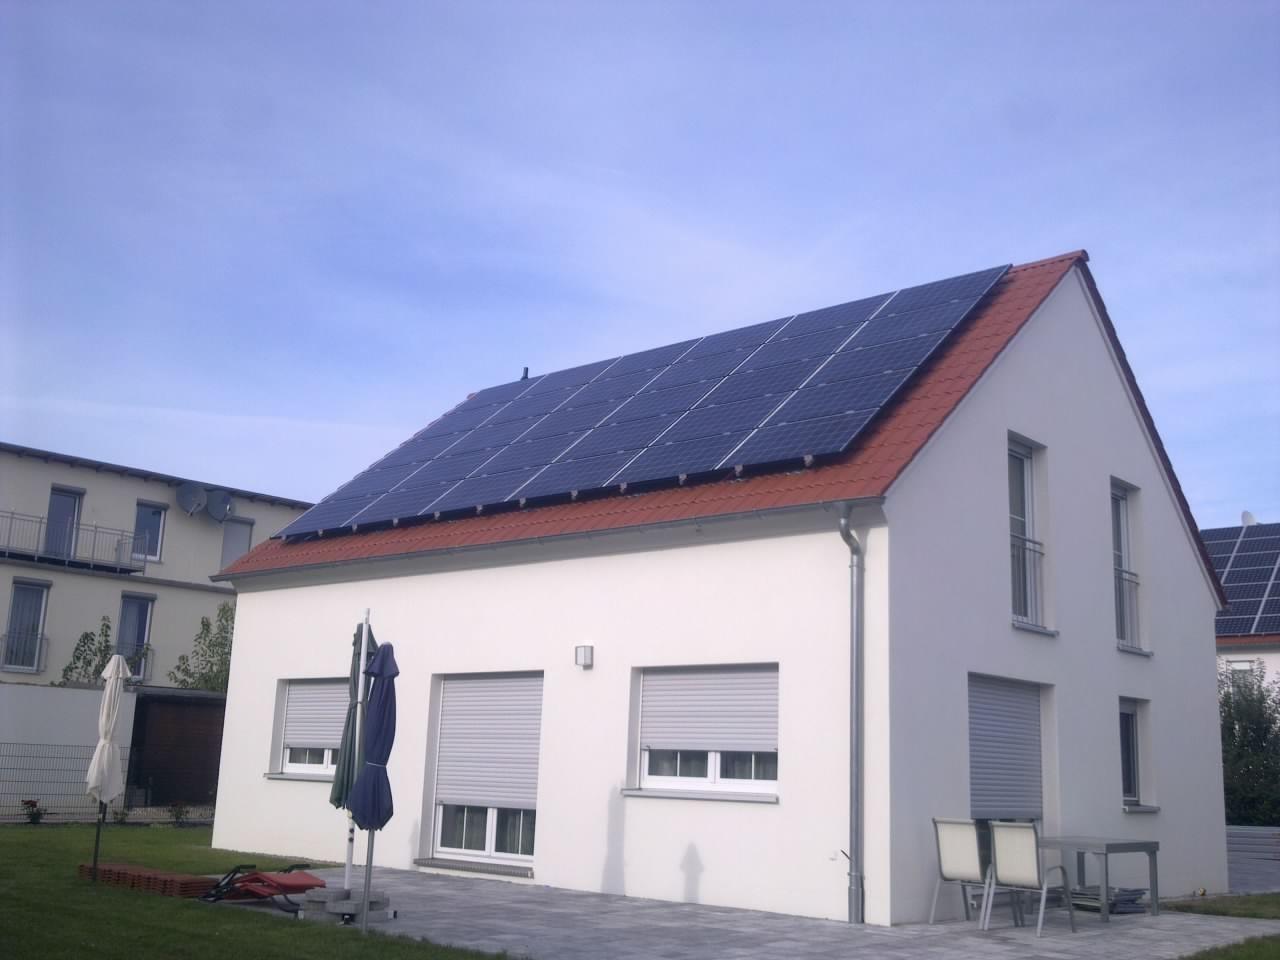 13 kWp Photovoltaikanlage in 93055 Burgweinting